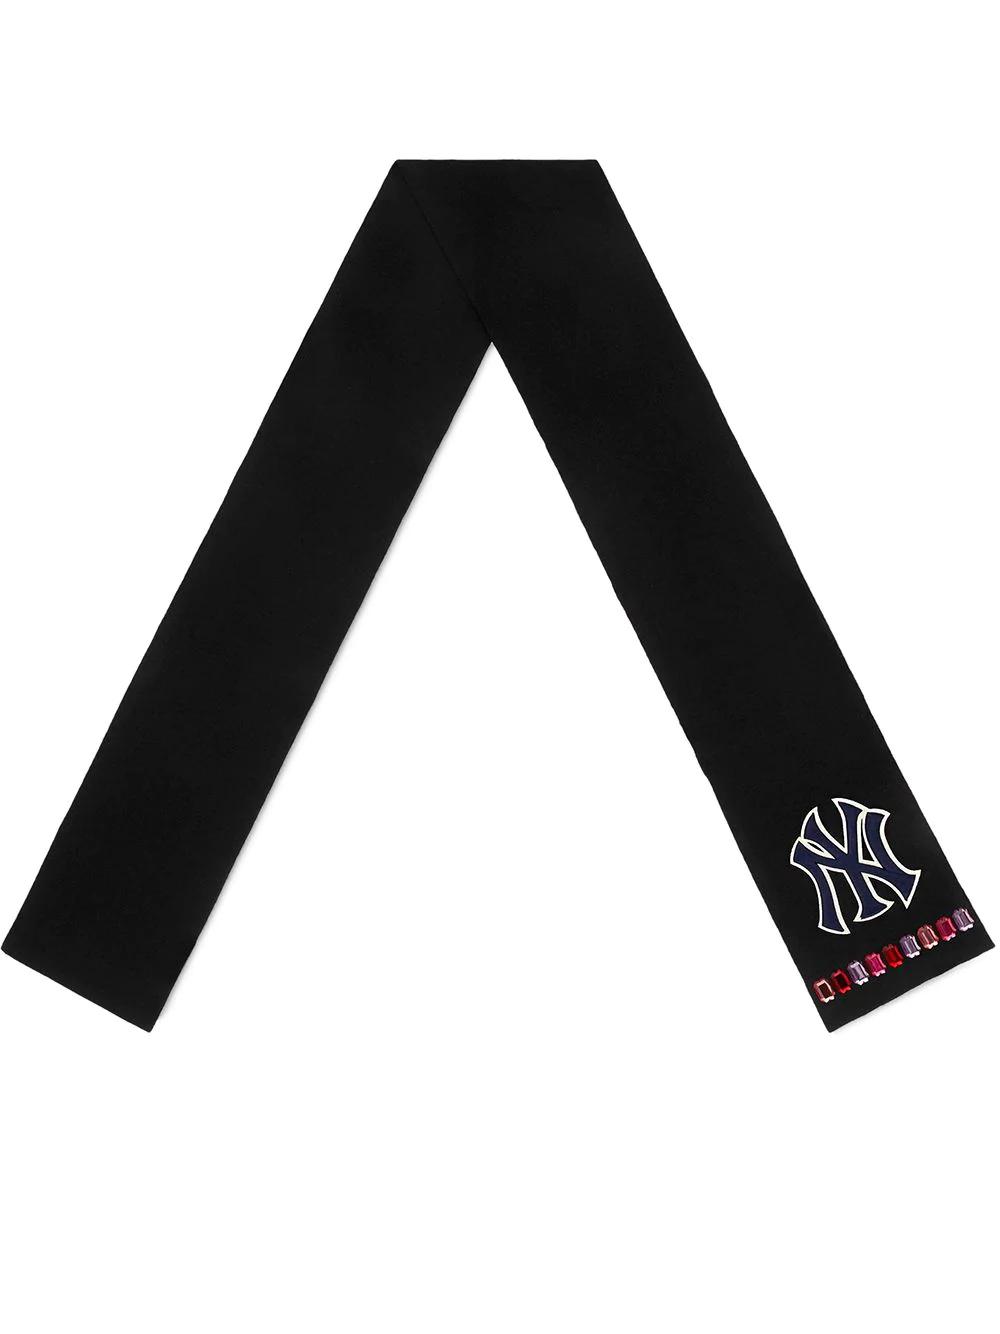 08ed3082 Gucci Schal Mit Ny Yankees™-Patch - Schwarz In Black   ModeSens